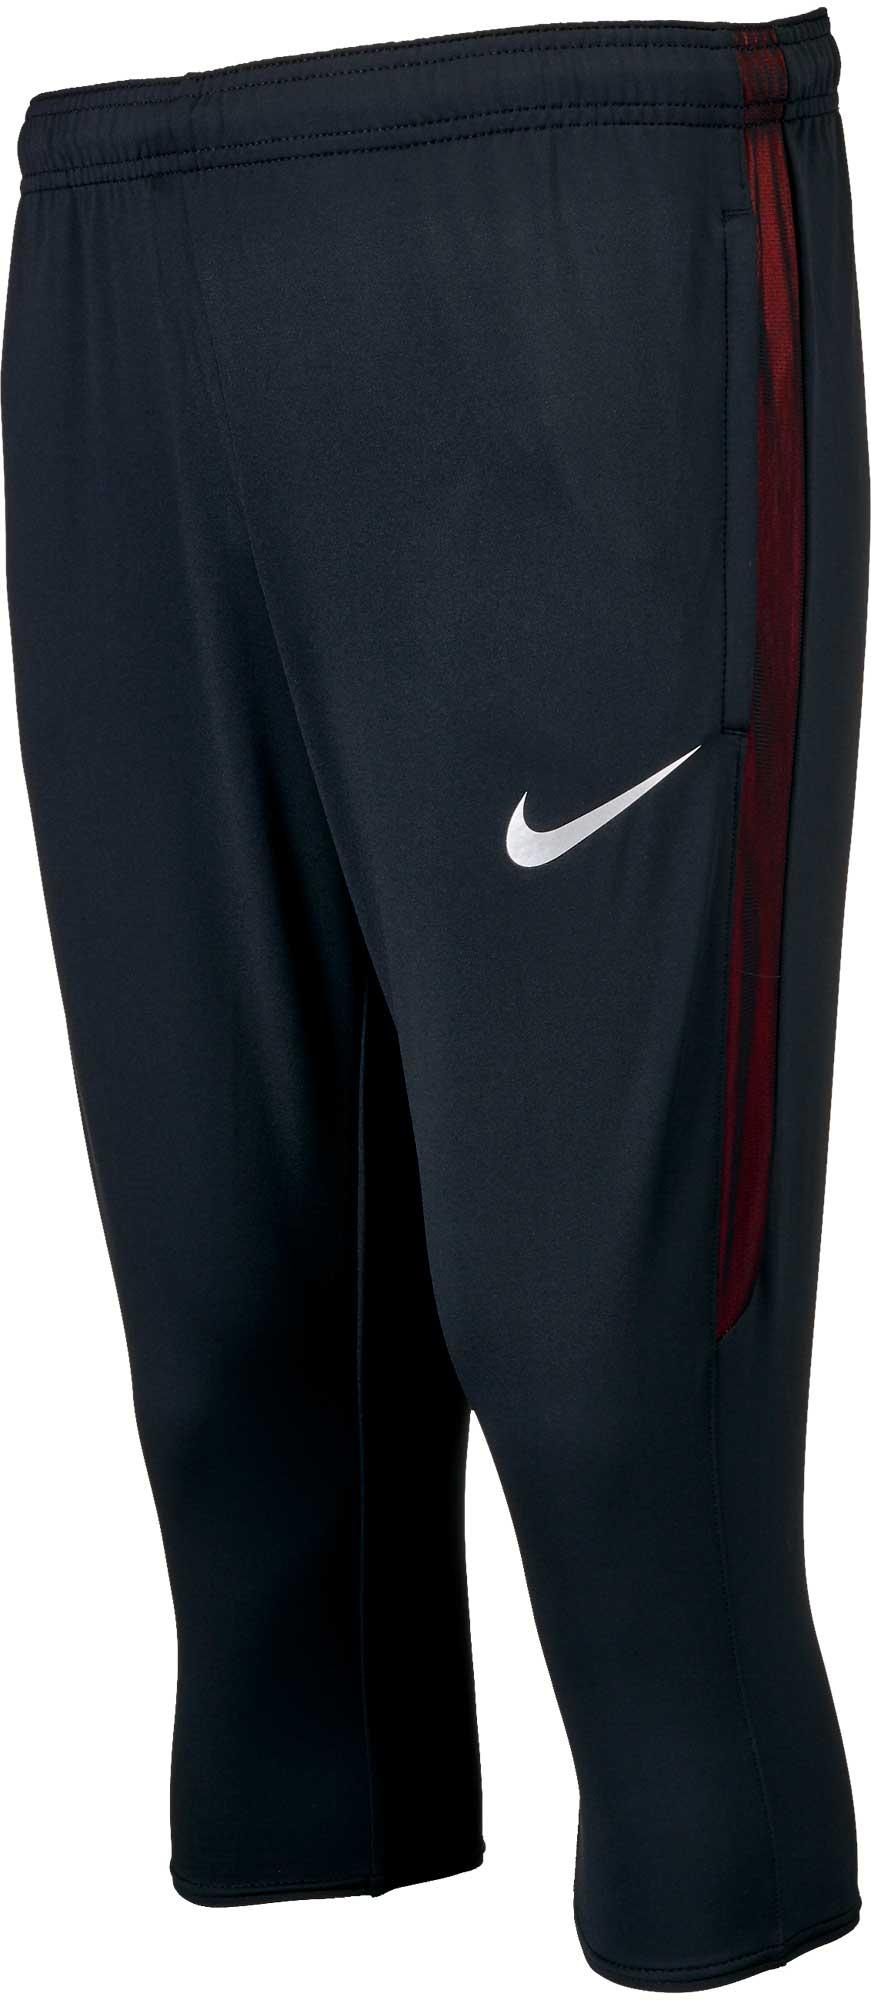 3/4 black shorts